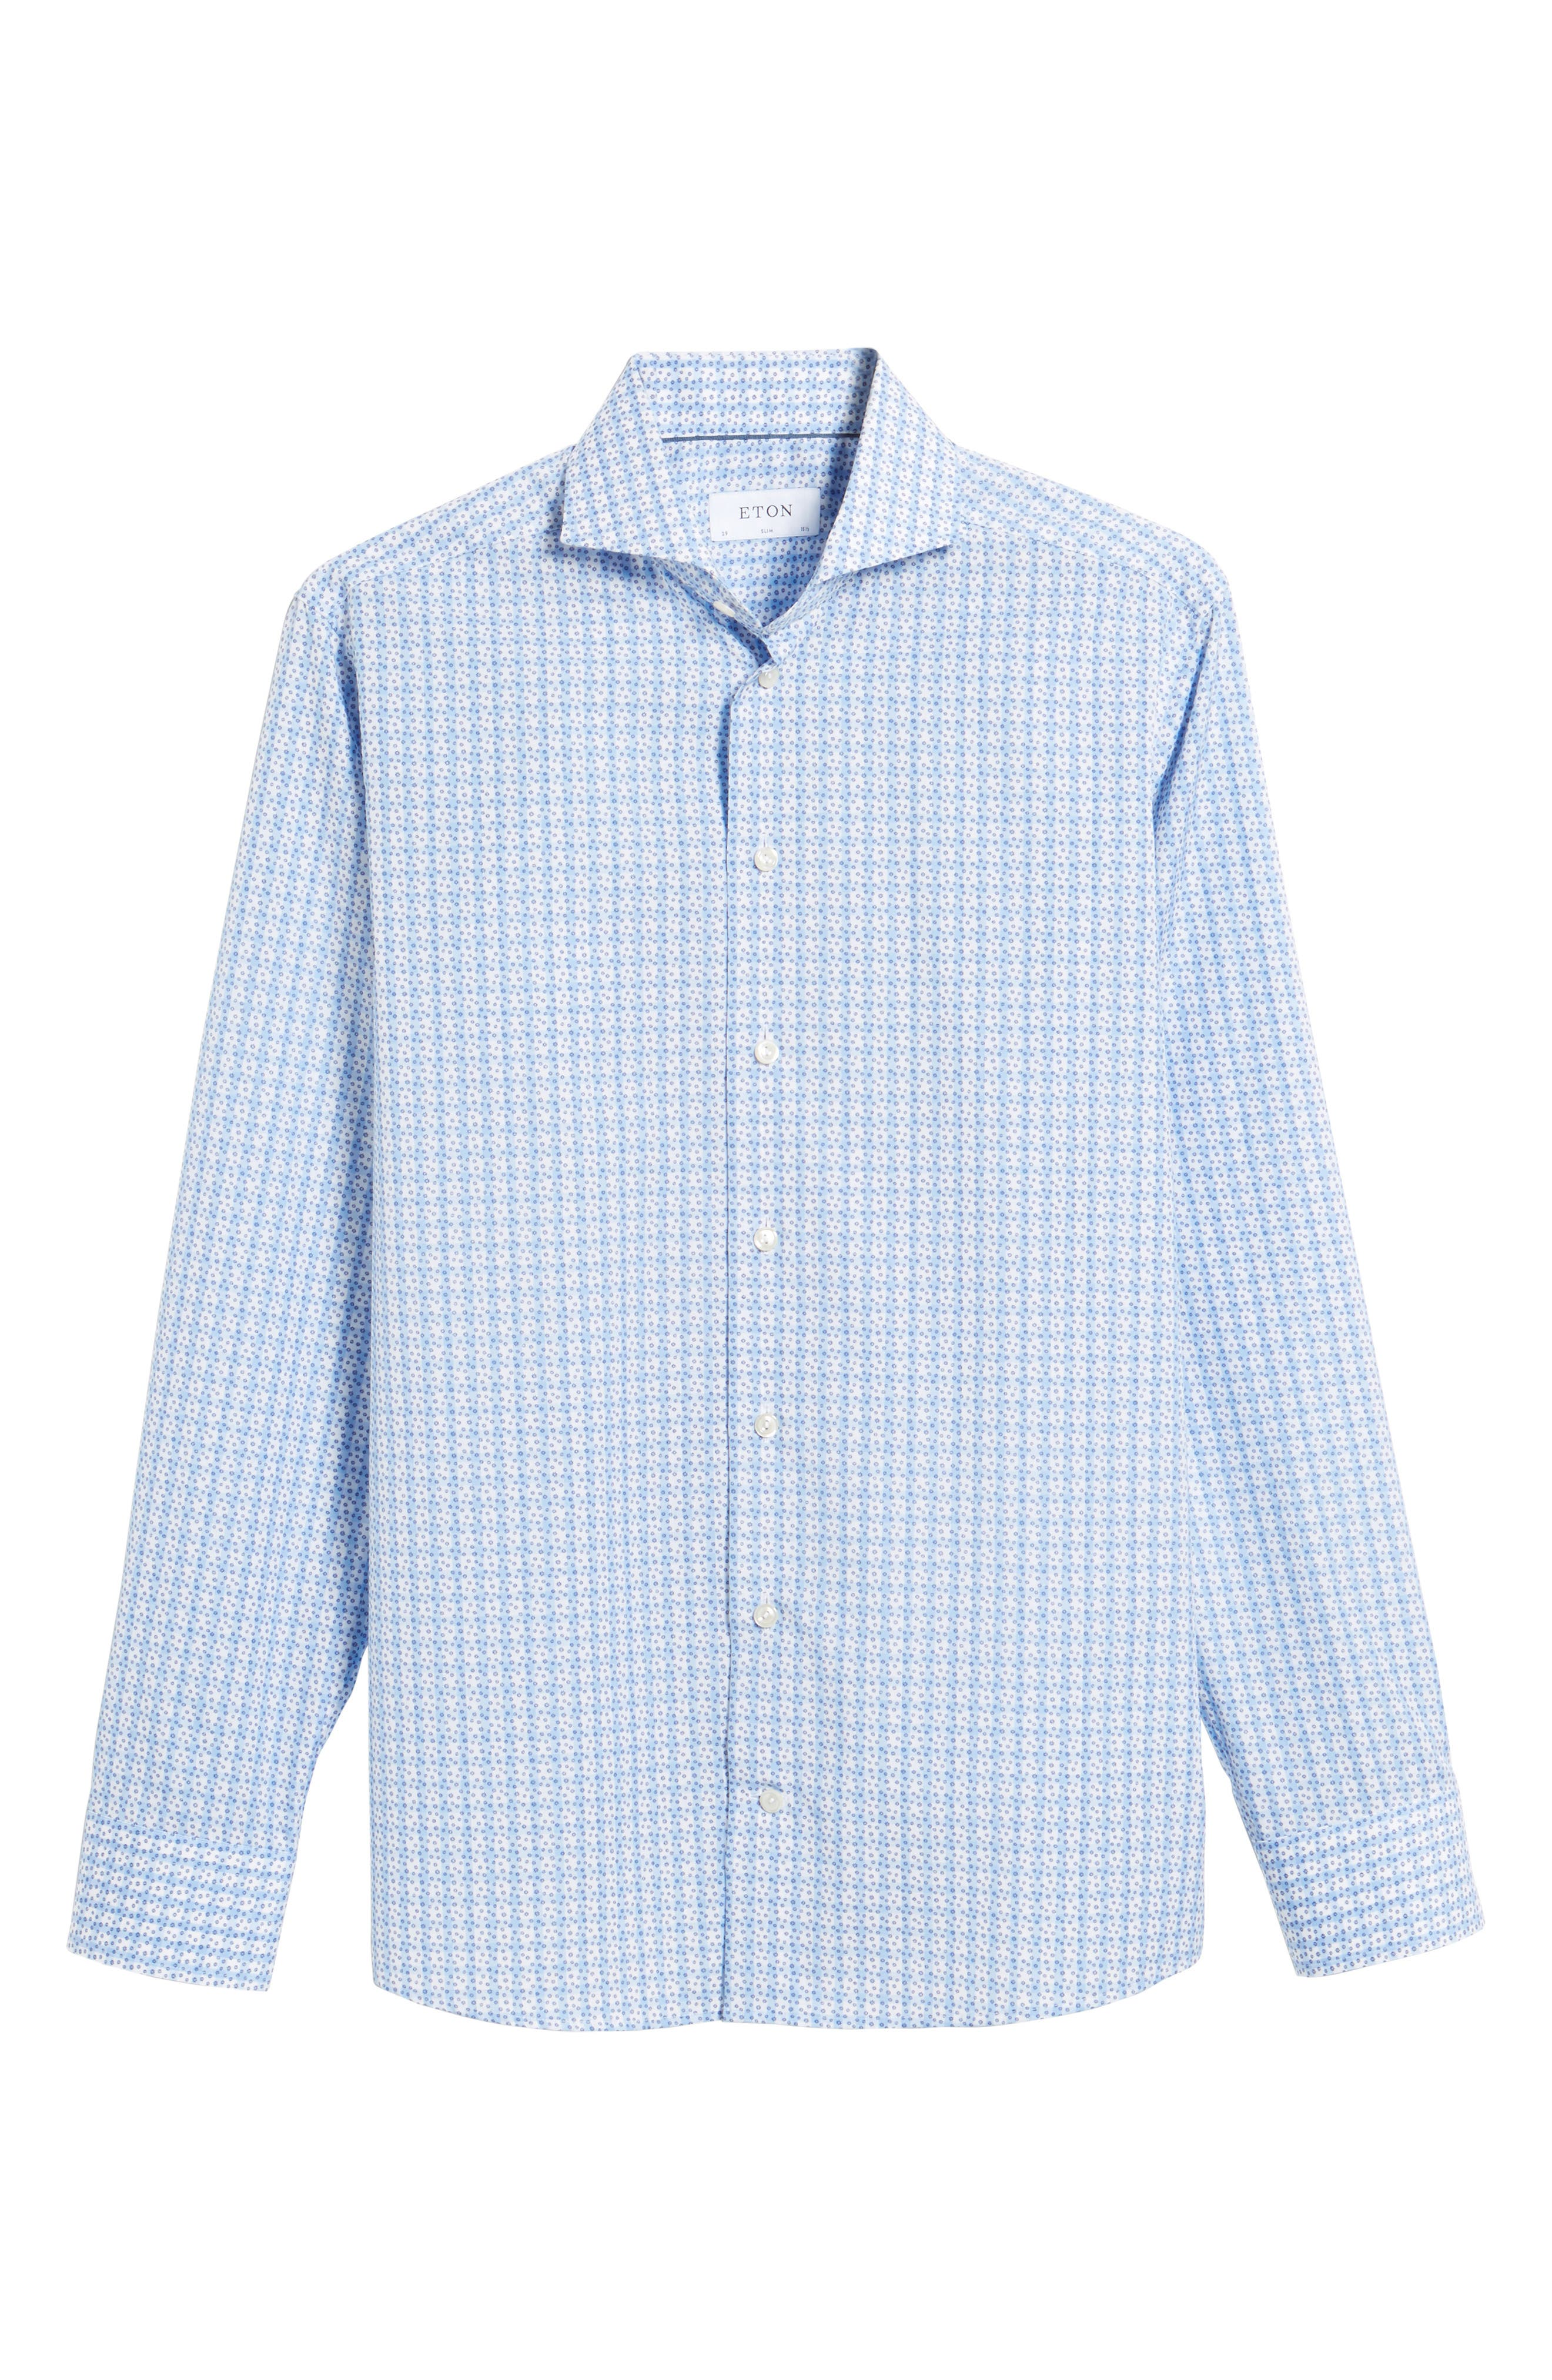 Alternate Image 4  - Eton Slim Fit Geometric Dress Shirt